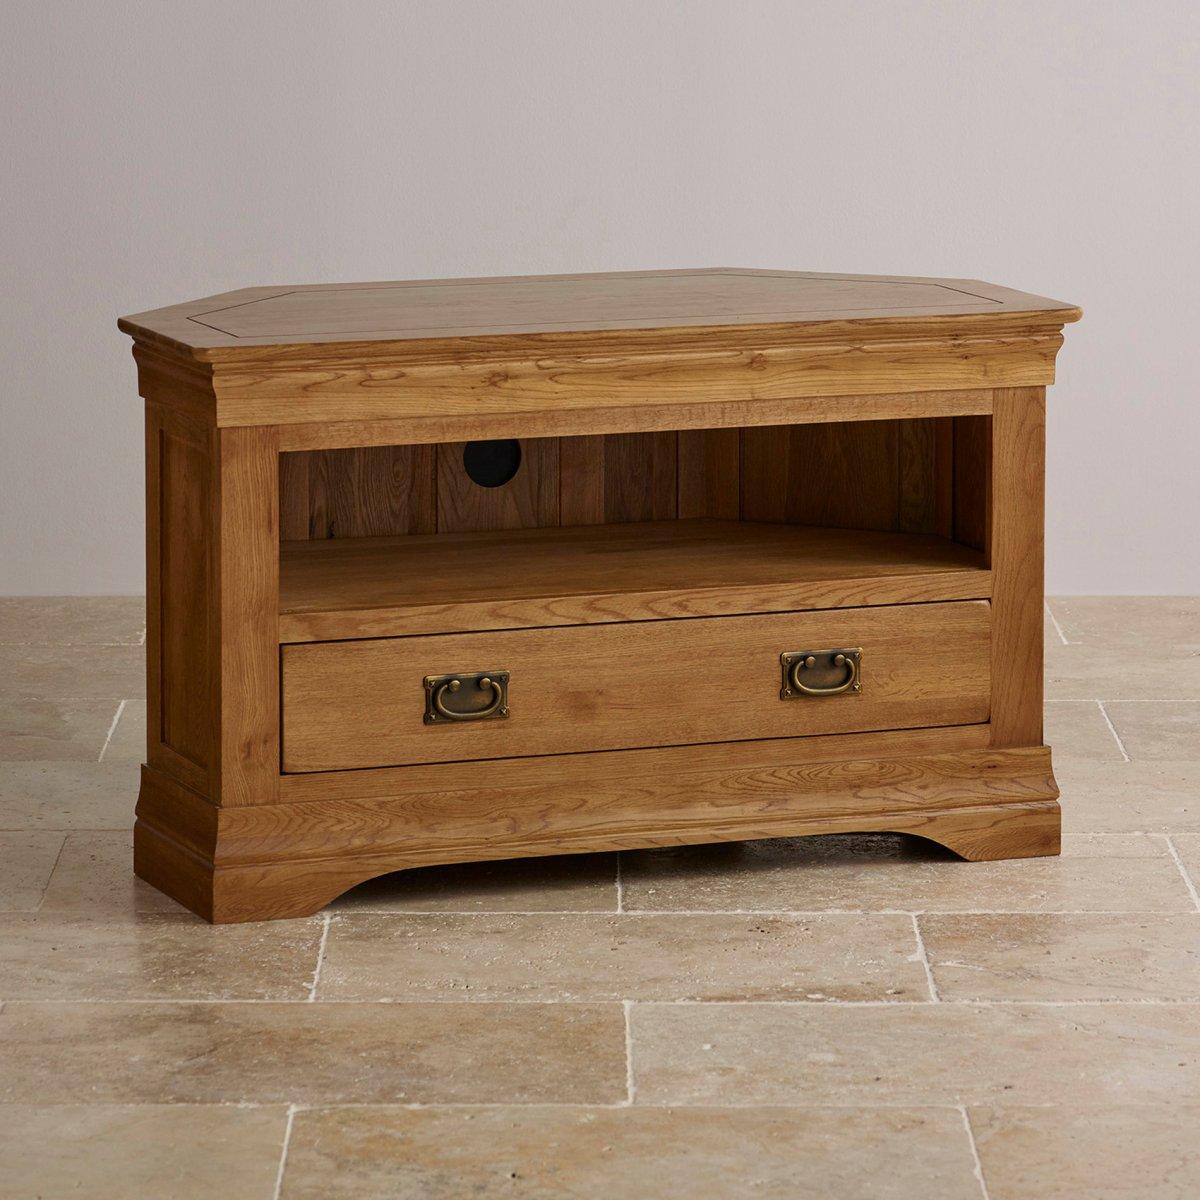 French farmhouse corner tv unit solid oak oak for Farmhouse rustic oak